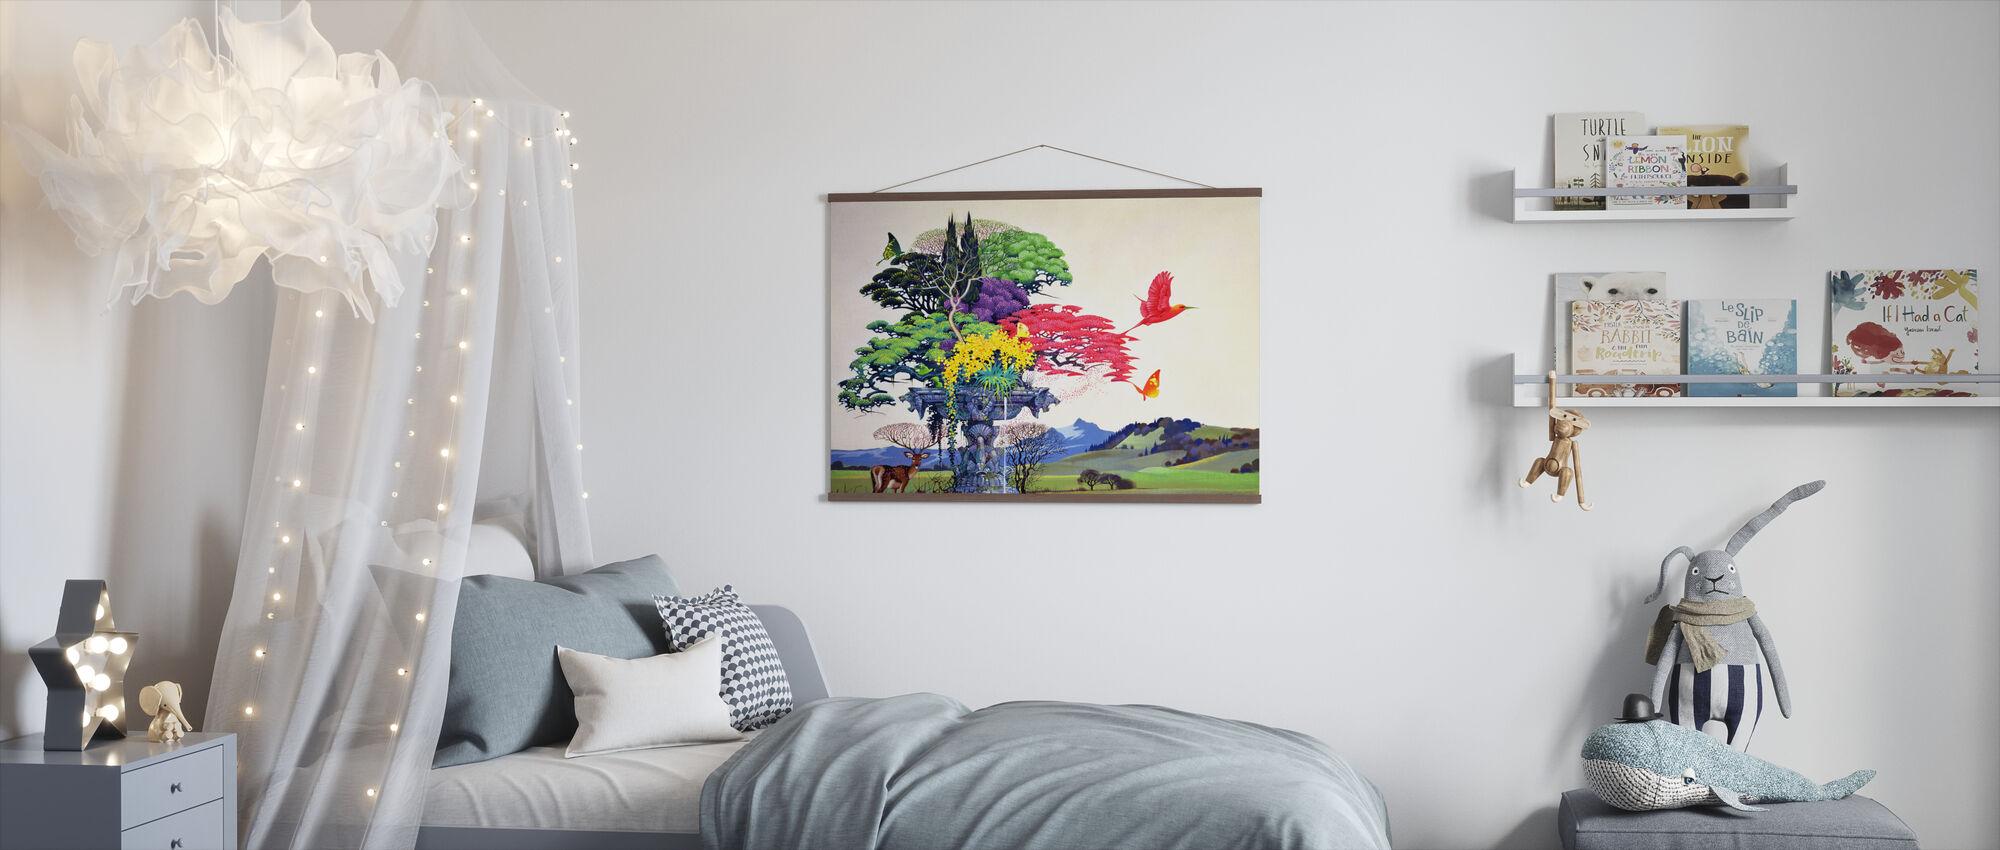 Regnbue-treet - Plakat - Barnerom